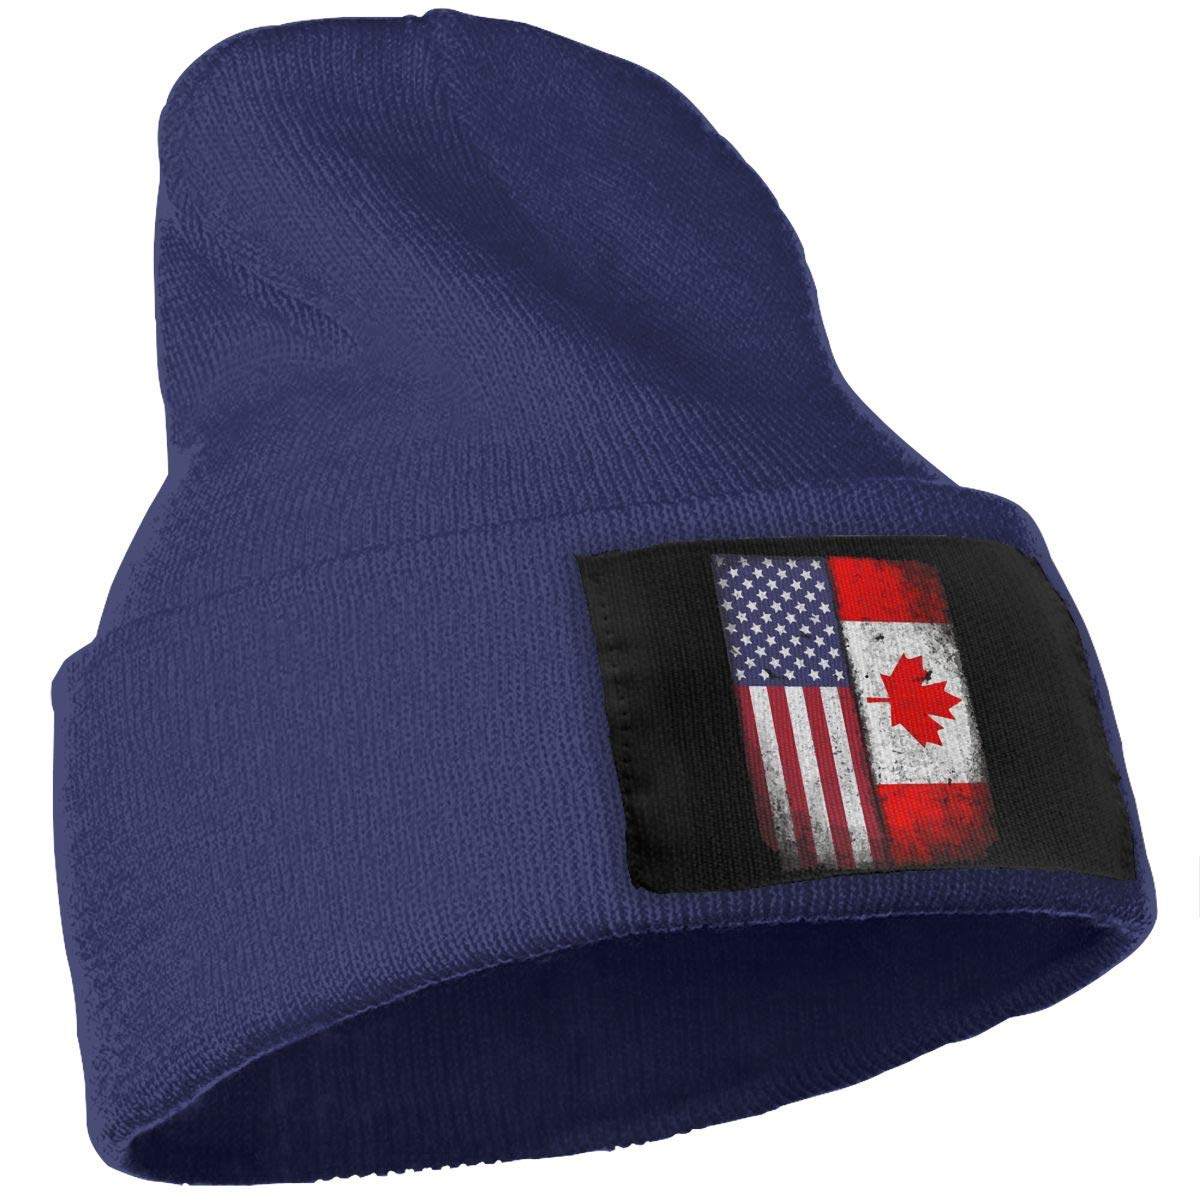 Canadian American Flag Warm Beanie Hat WHOO93@Y Mens Womens 100/% Acrylic Knitting Hat Cap